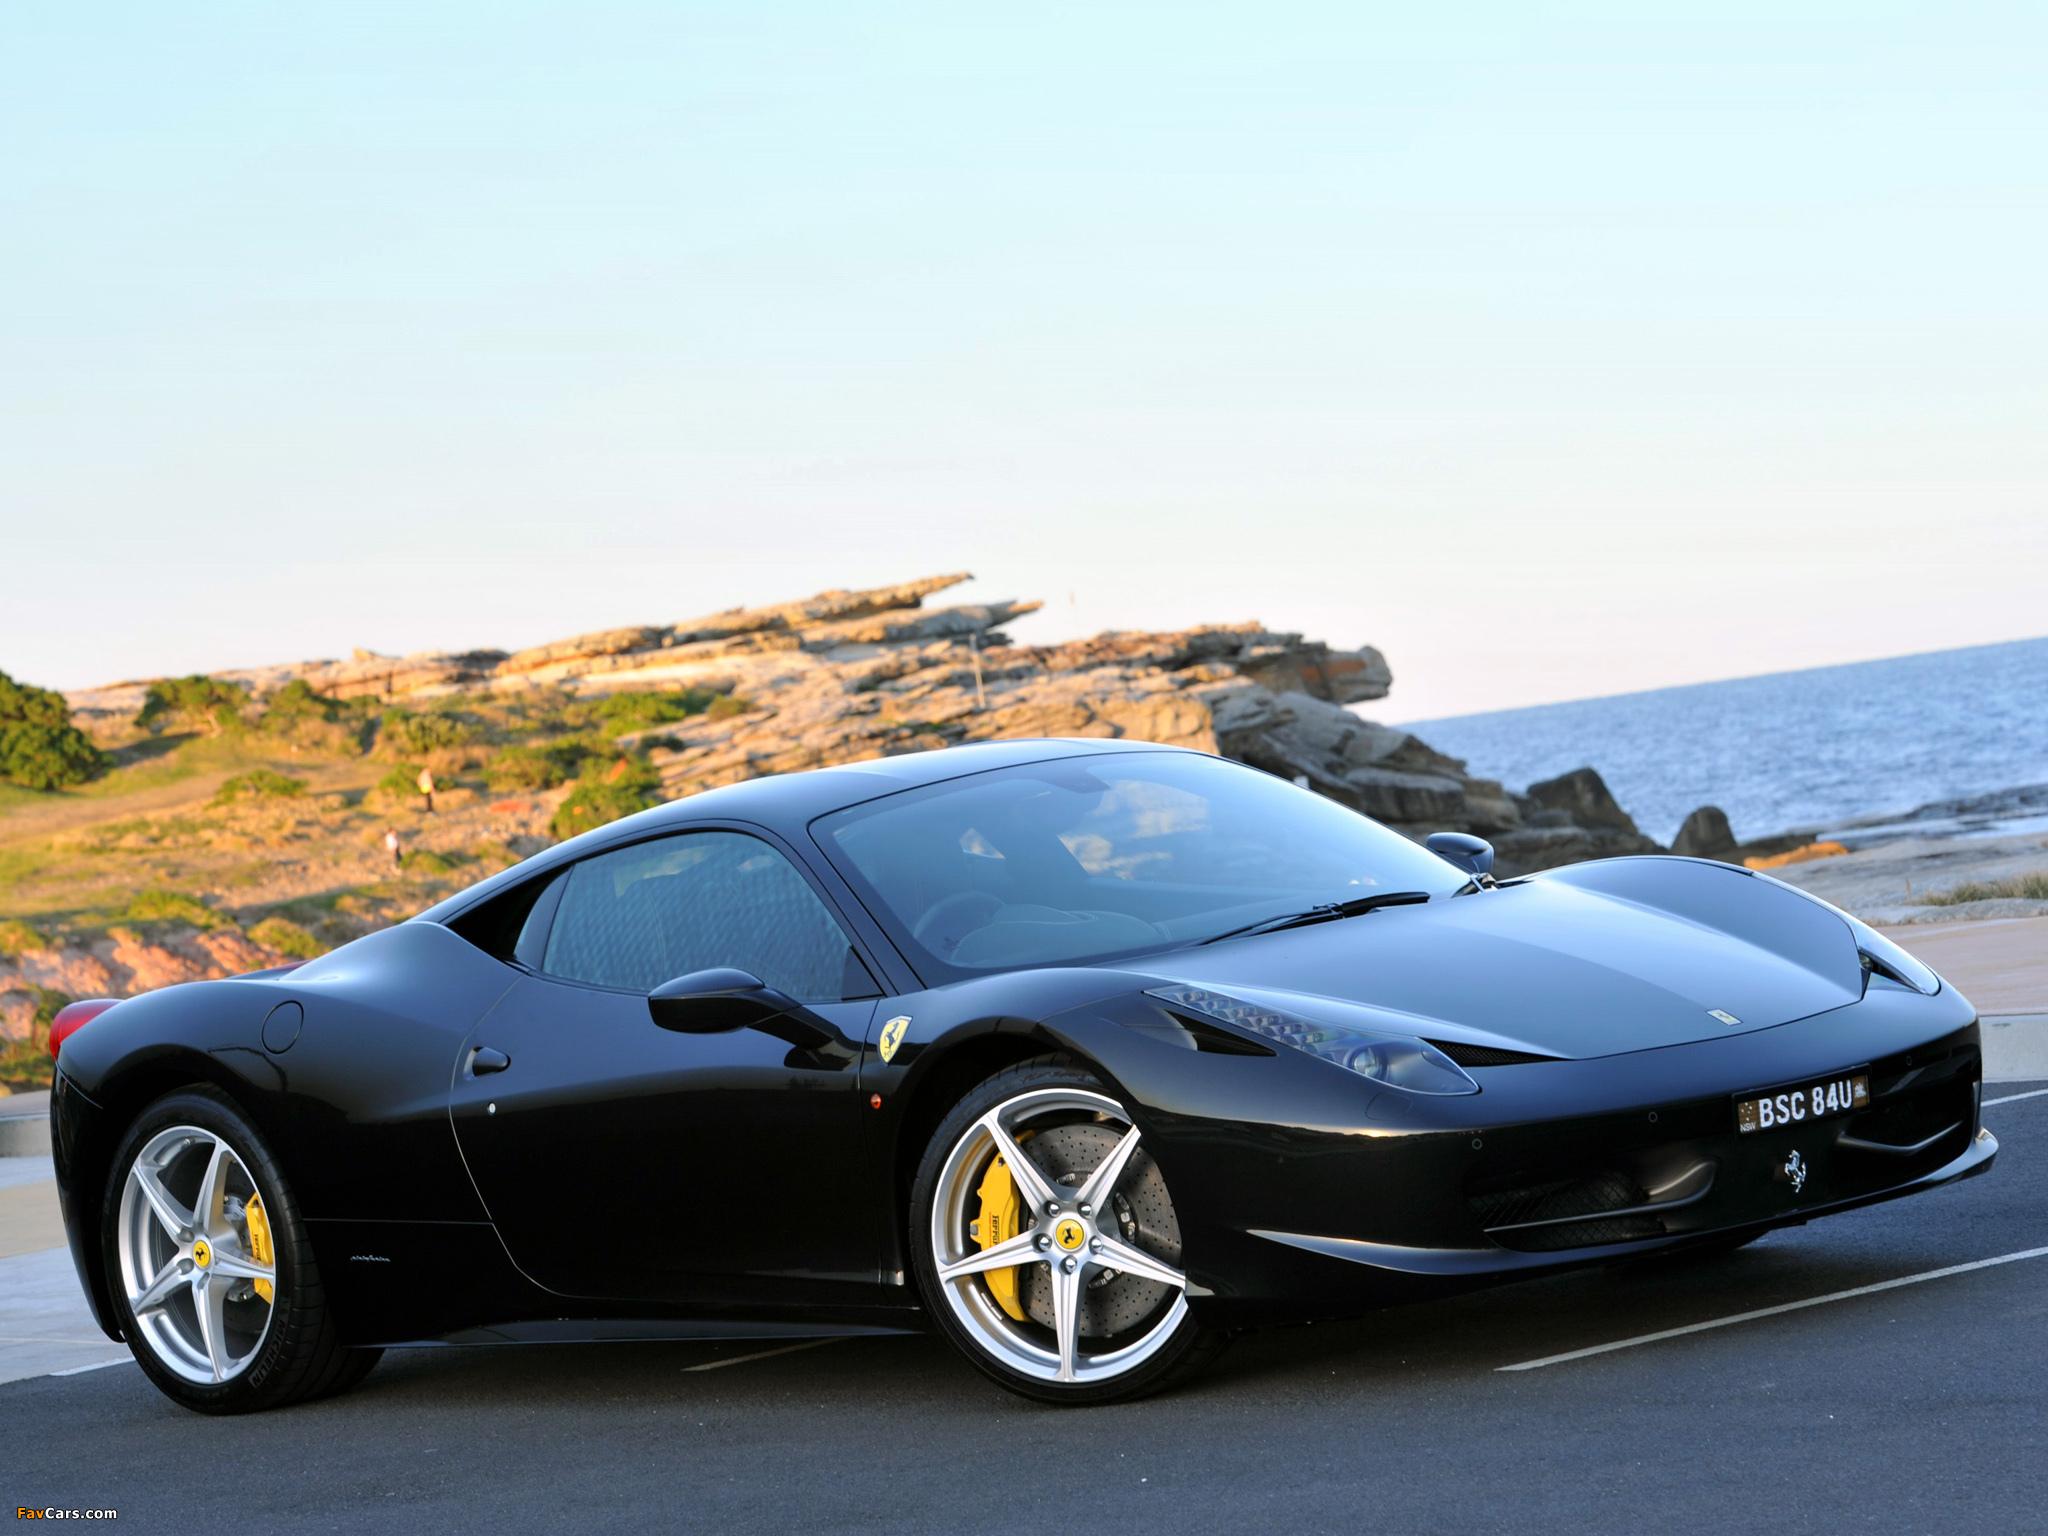 Download Red Black Ferrari 2048 X 2048 Wallpapers: Ferrari 458 Italia AU-spec 2009 Wallpapers (2048x1536